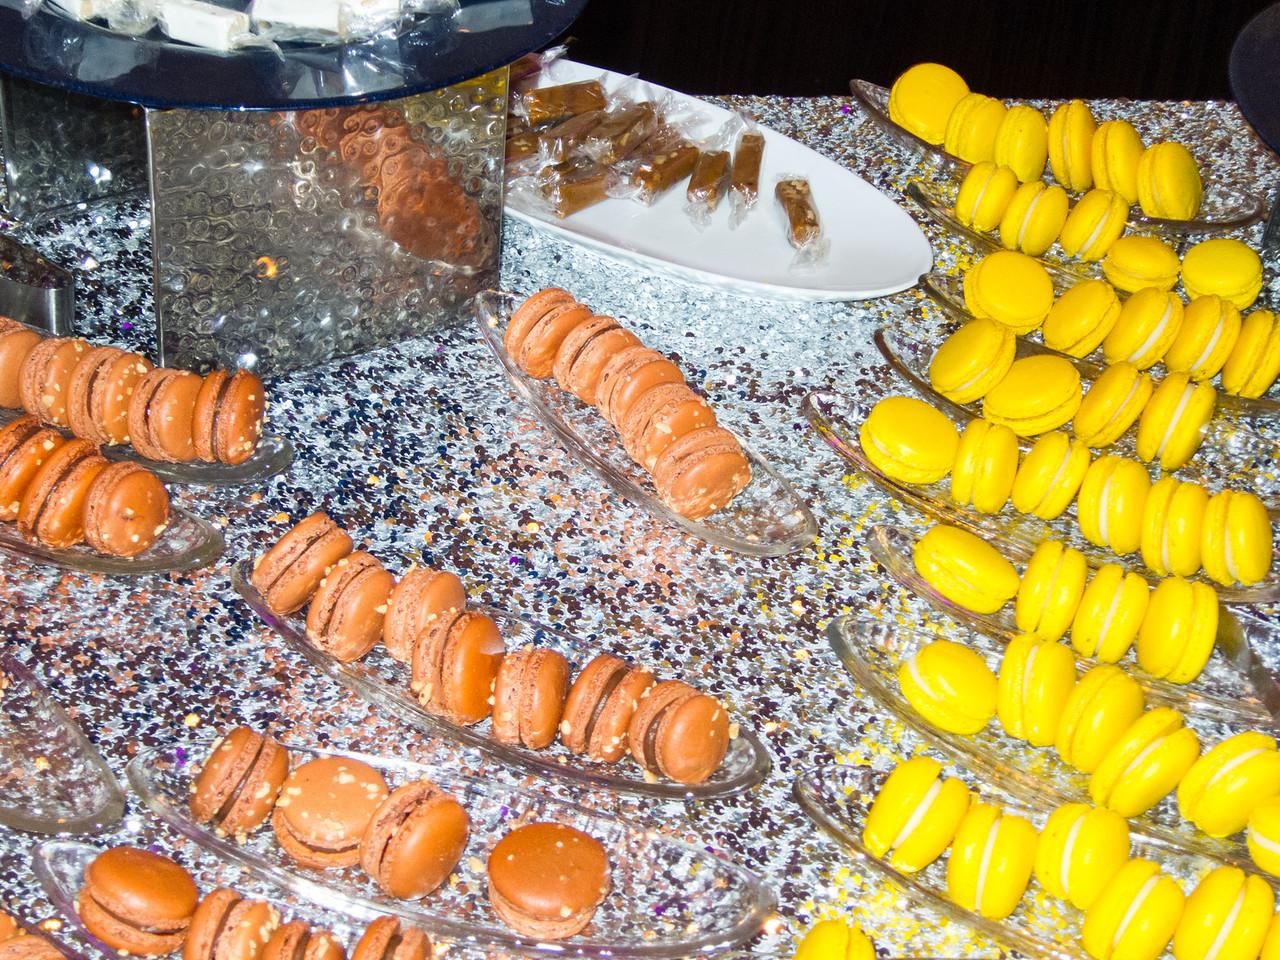 SOBEWFF: Macarons